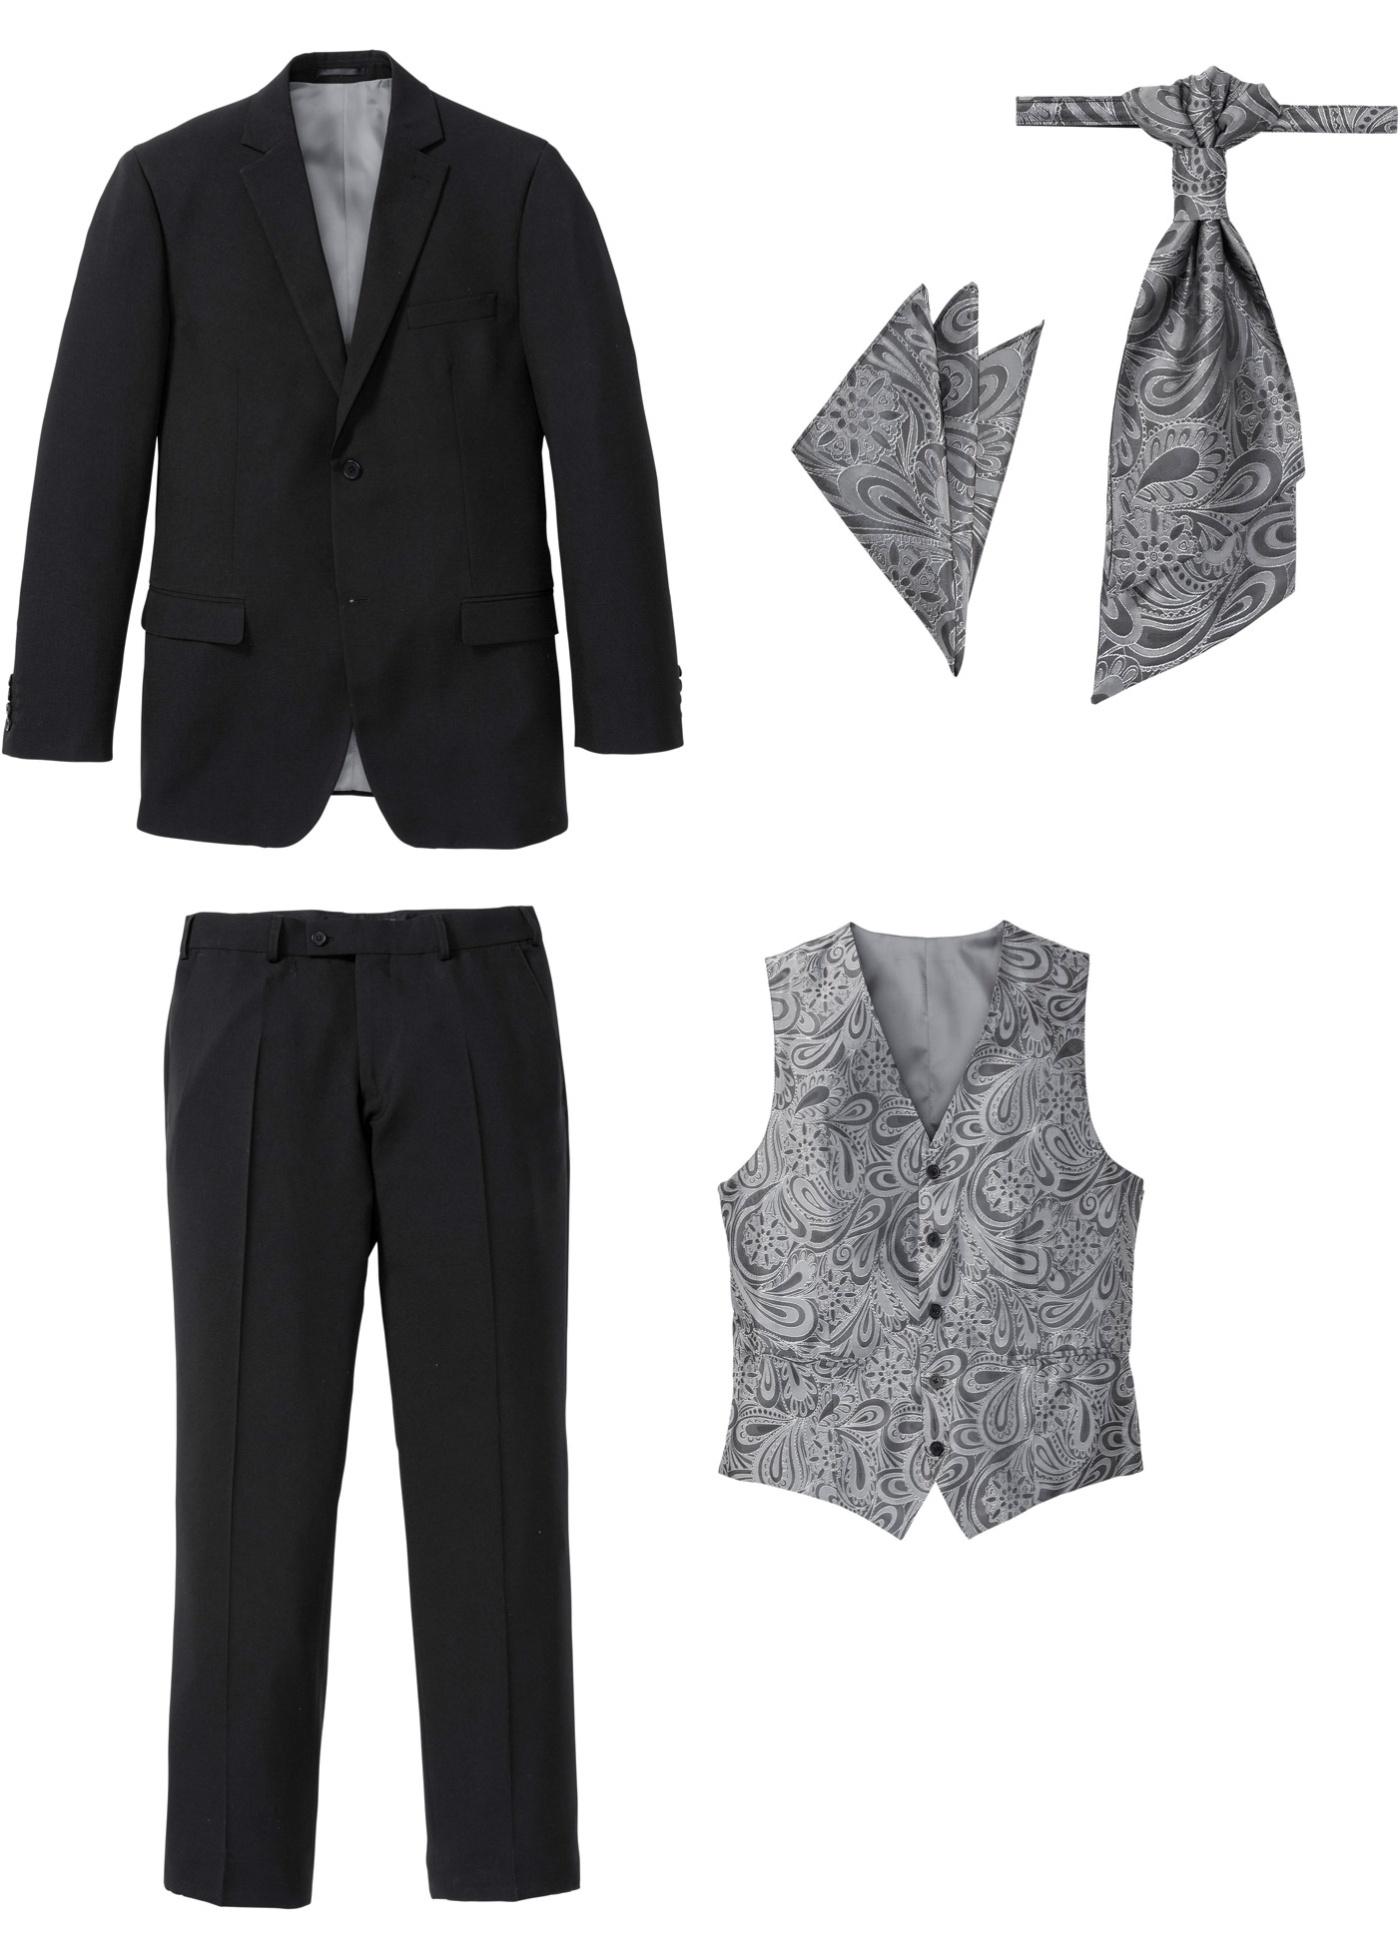 Image of Anzug (5-tlg. Set): Sakko, Hose, Weste, Plastron, Einstecktu